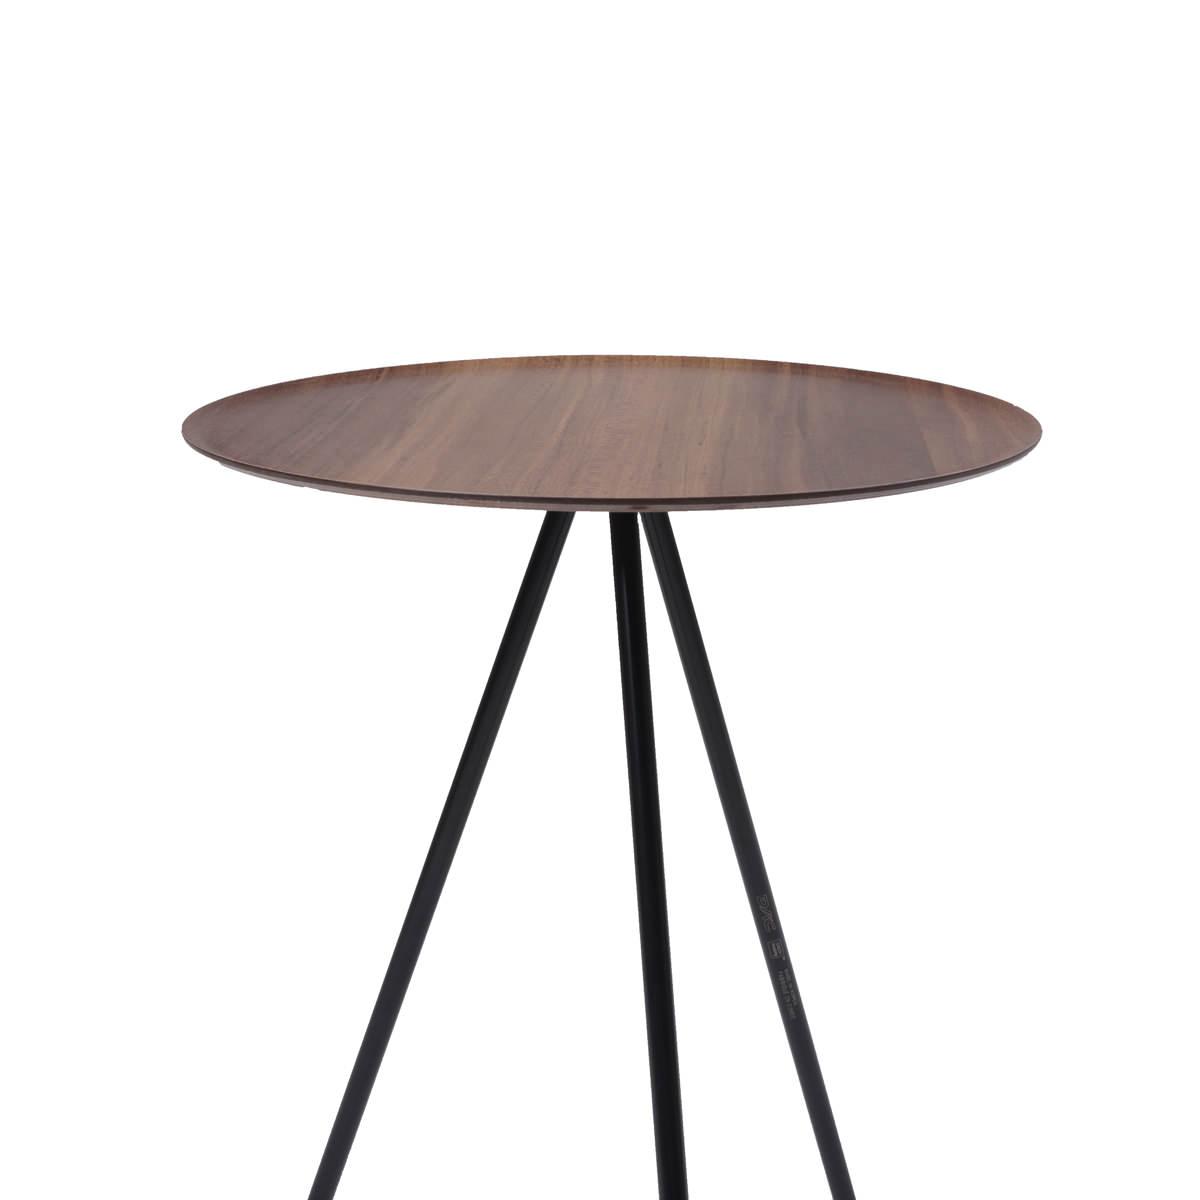 https://www.helinox.co.jp/product/home_deco_beach/table/detail/180/